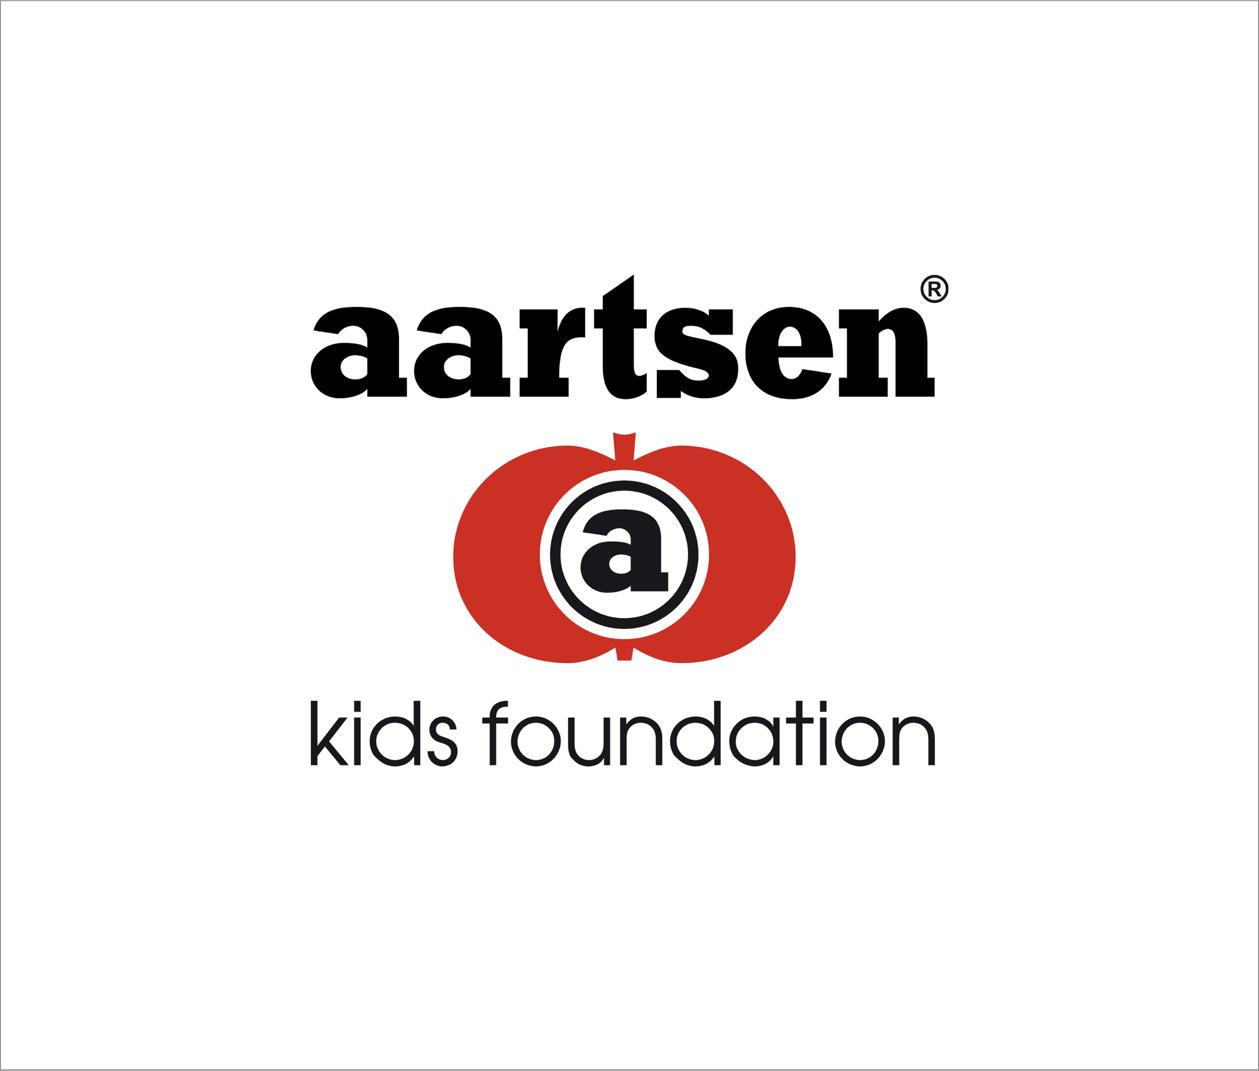 aartsenkidsfoundation-logo.png